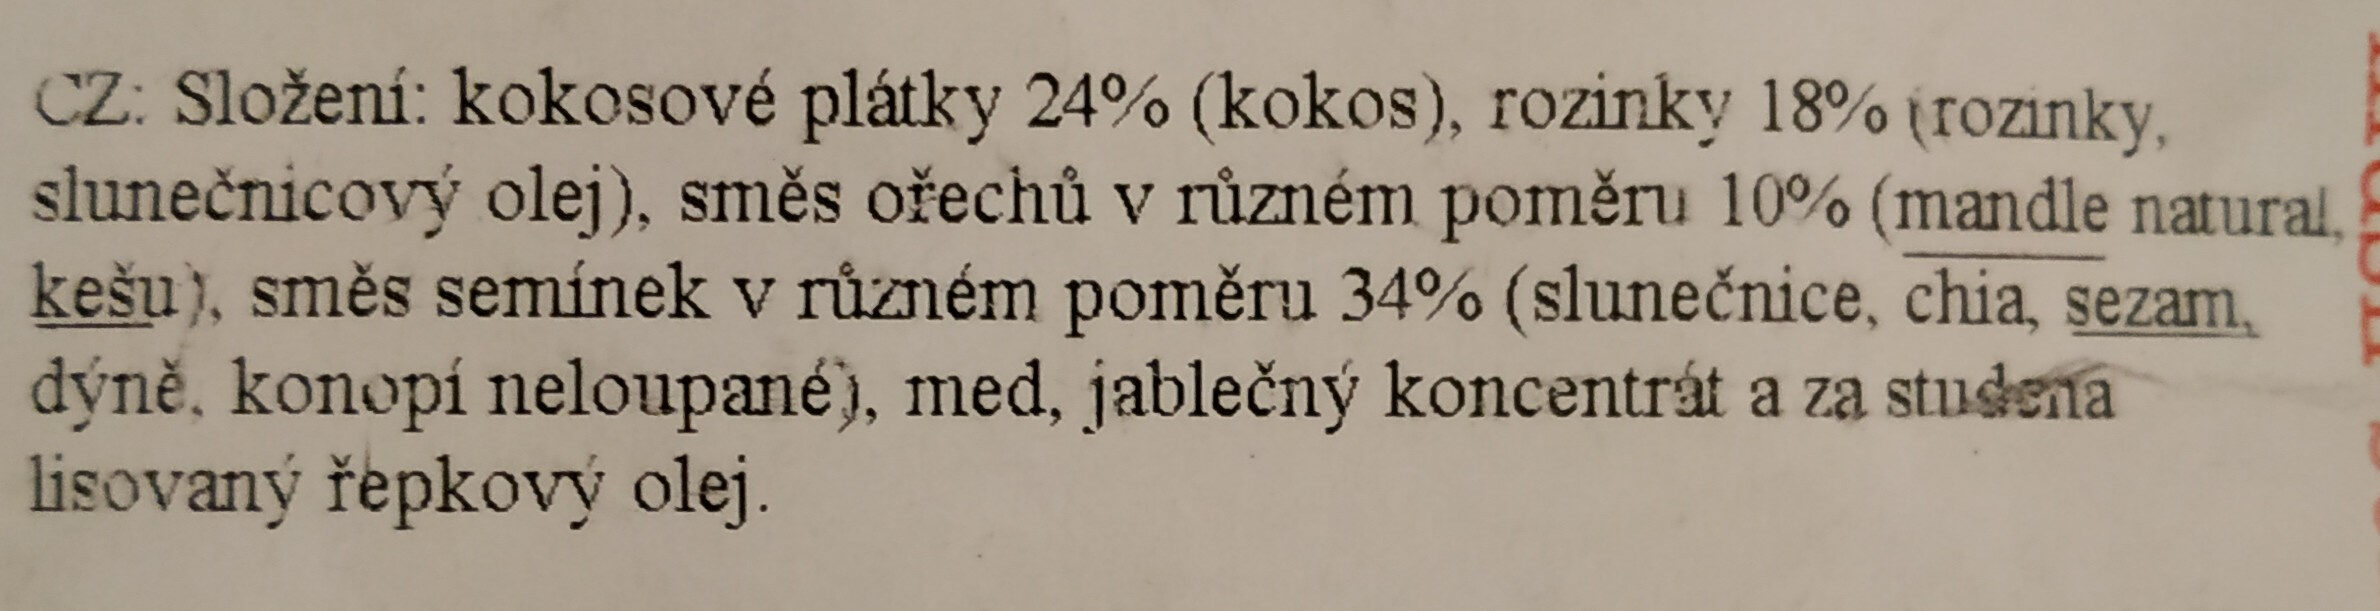 Spékané paleo - Ingredients - cs